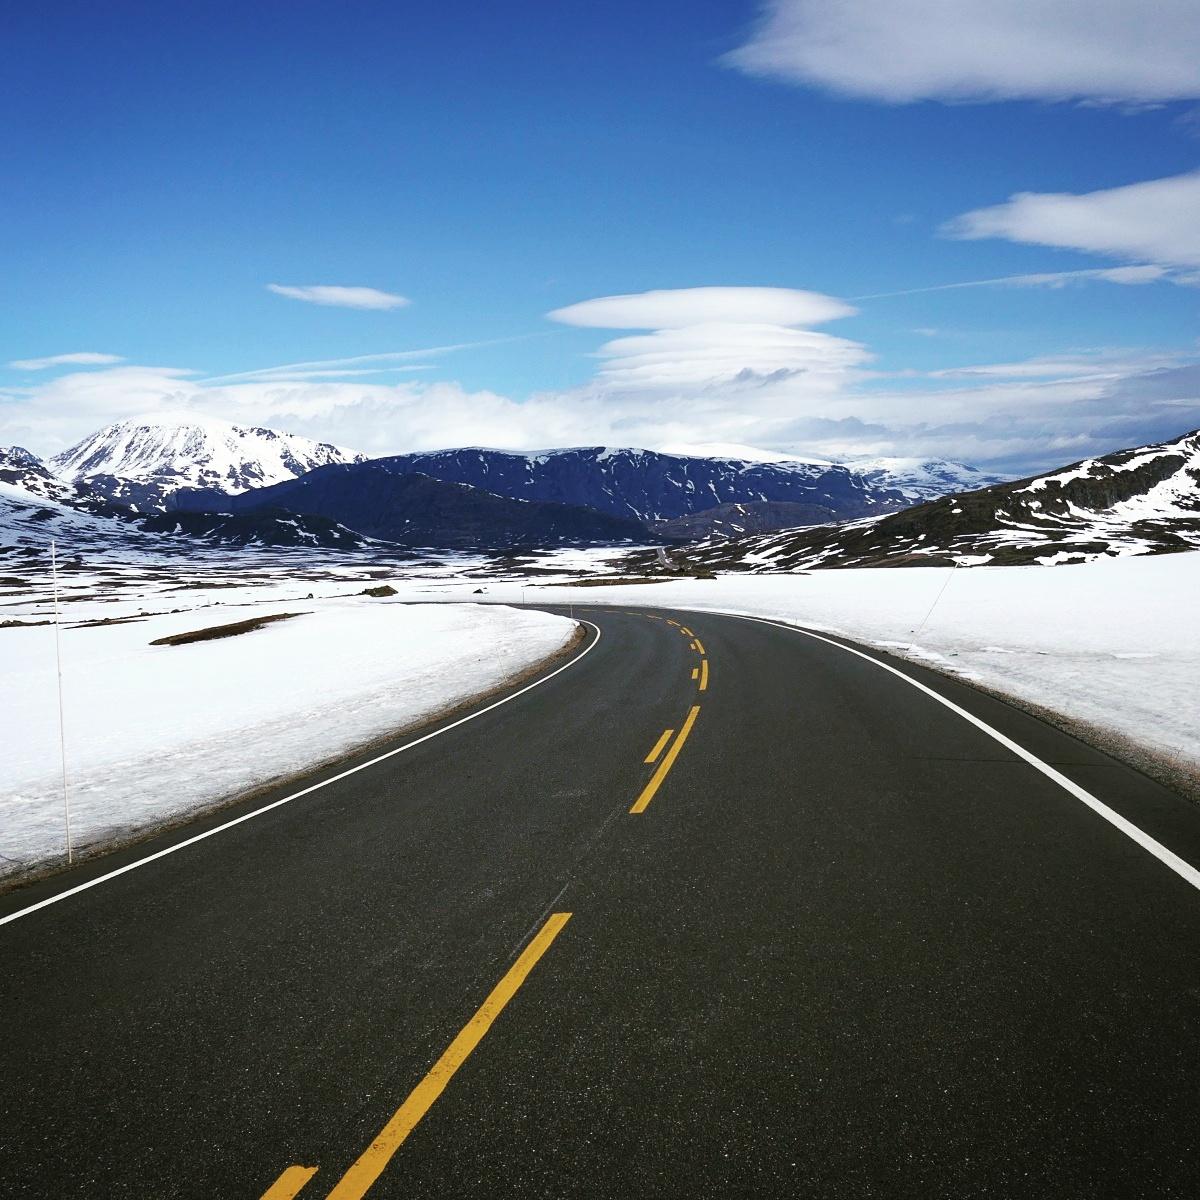 A mountain pass road cuts through the snowpack. Noah Stycker